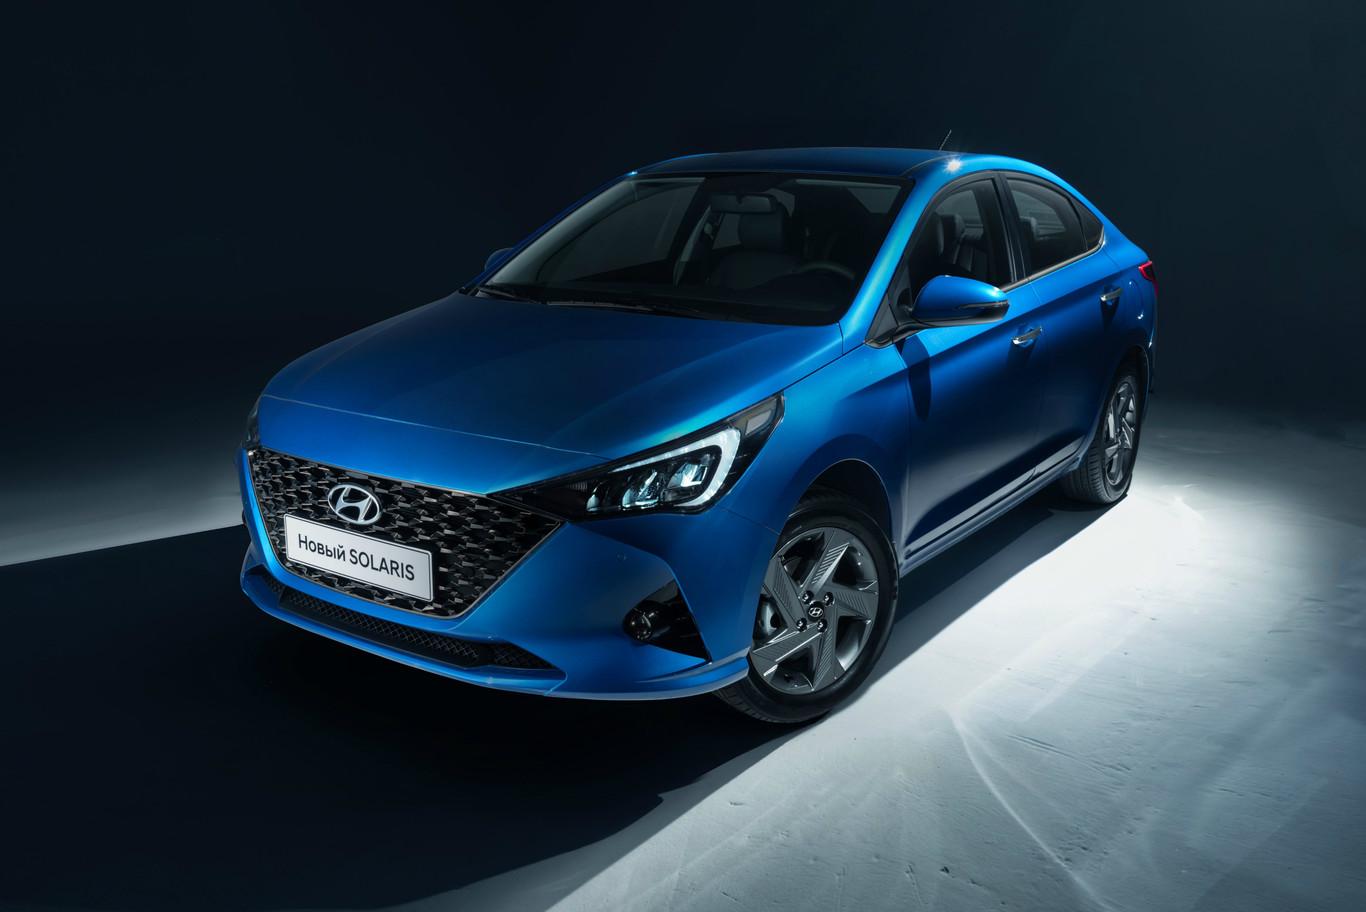 2021 Hyundai Accent Hatchback History